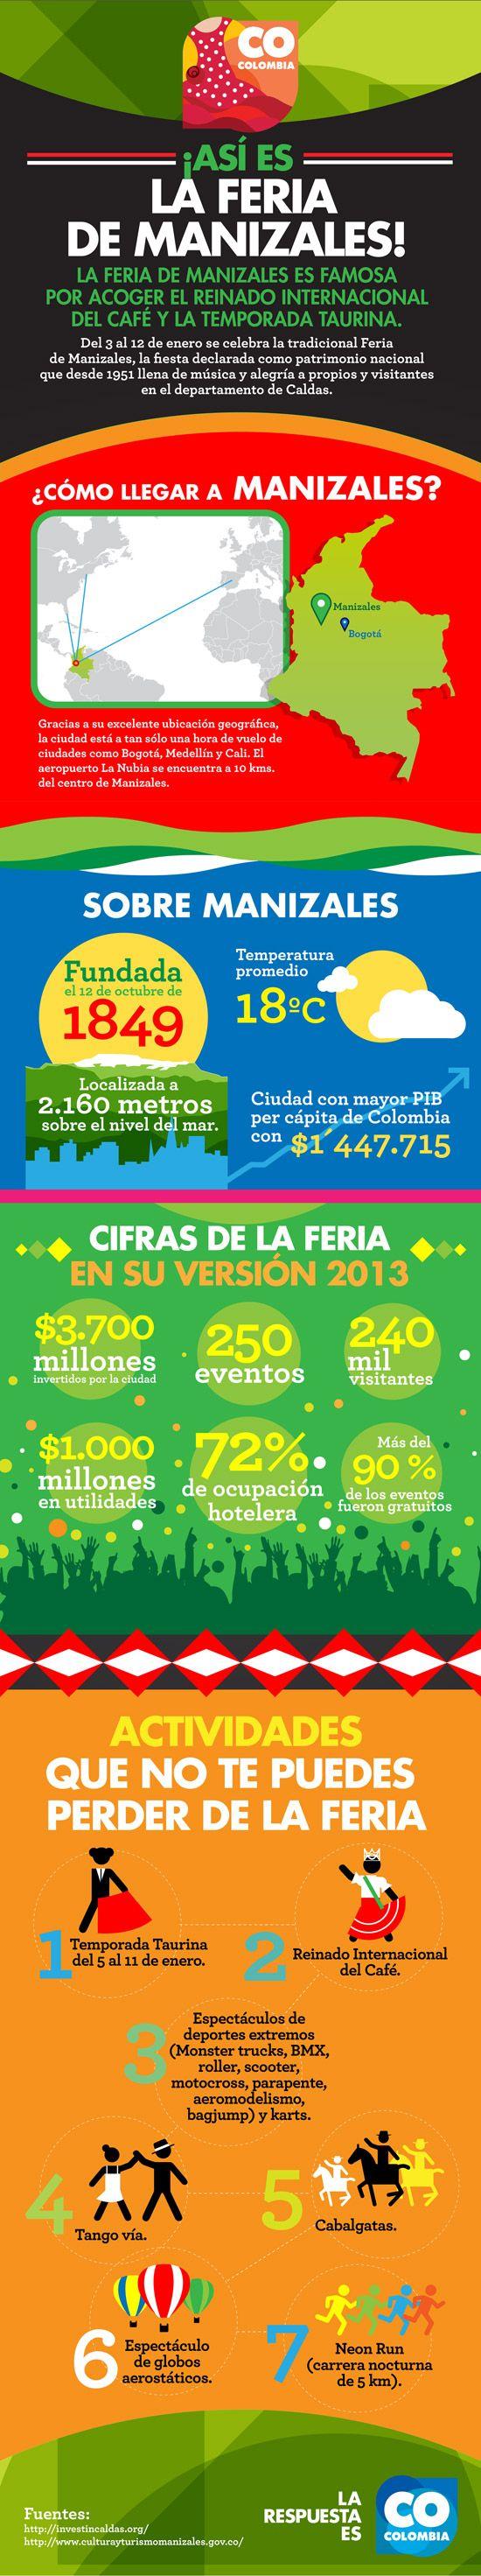 Infografia feria de #manizales